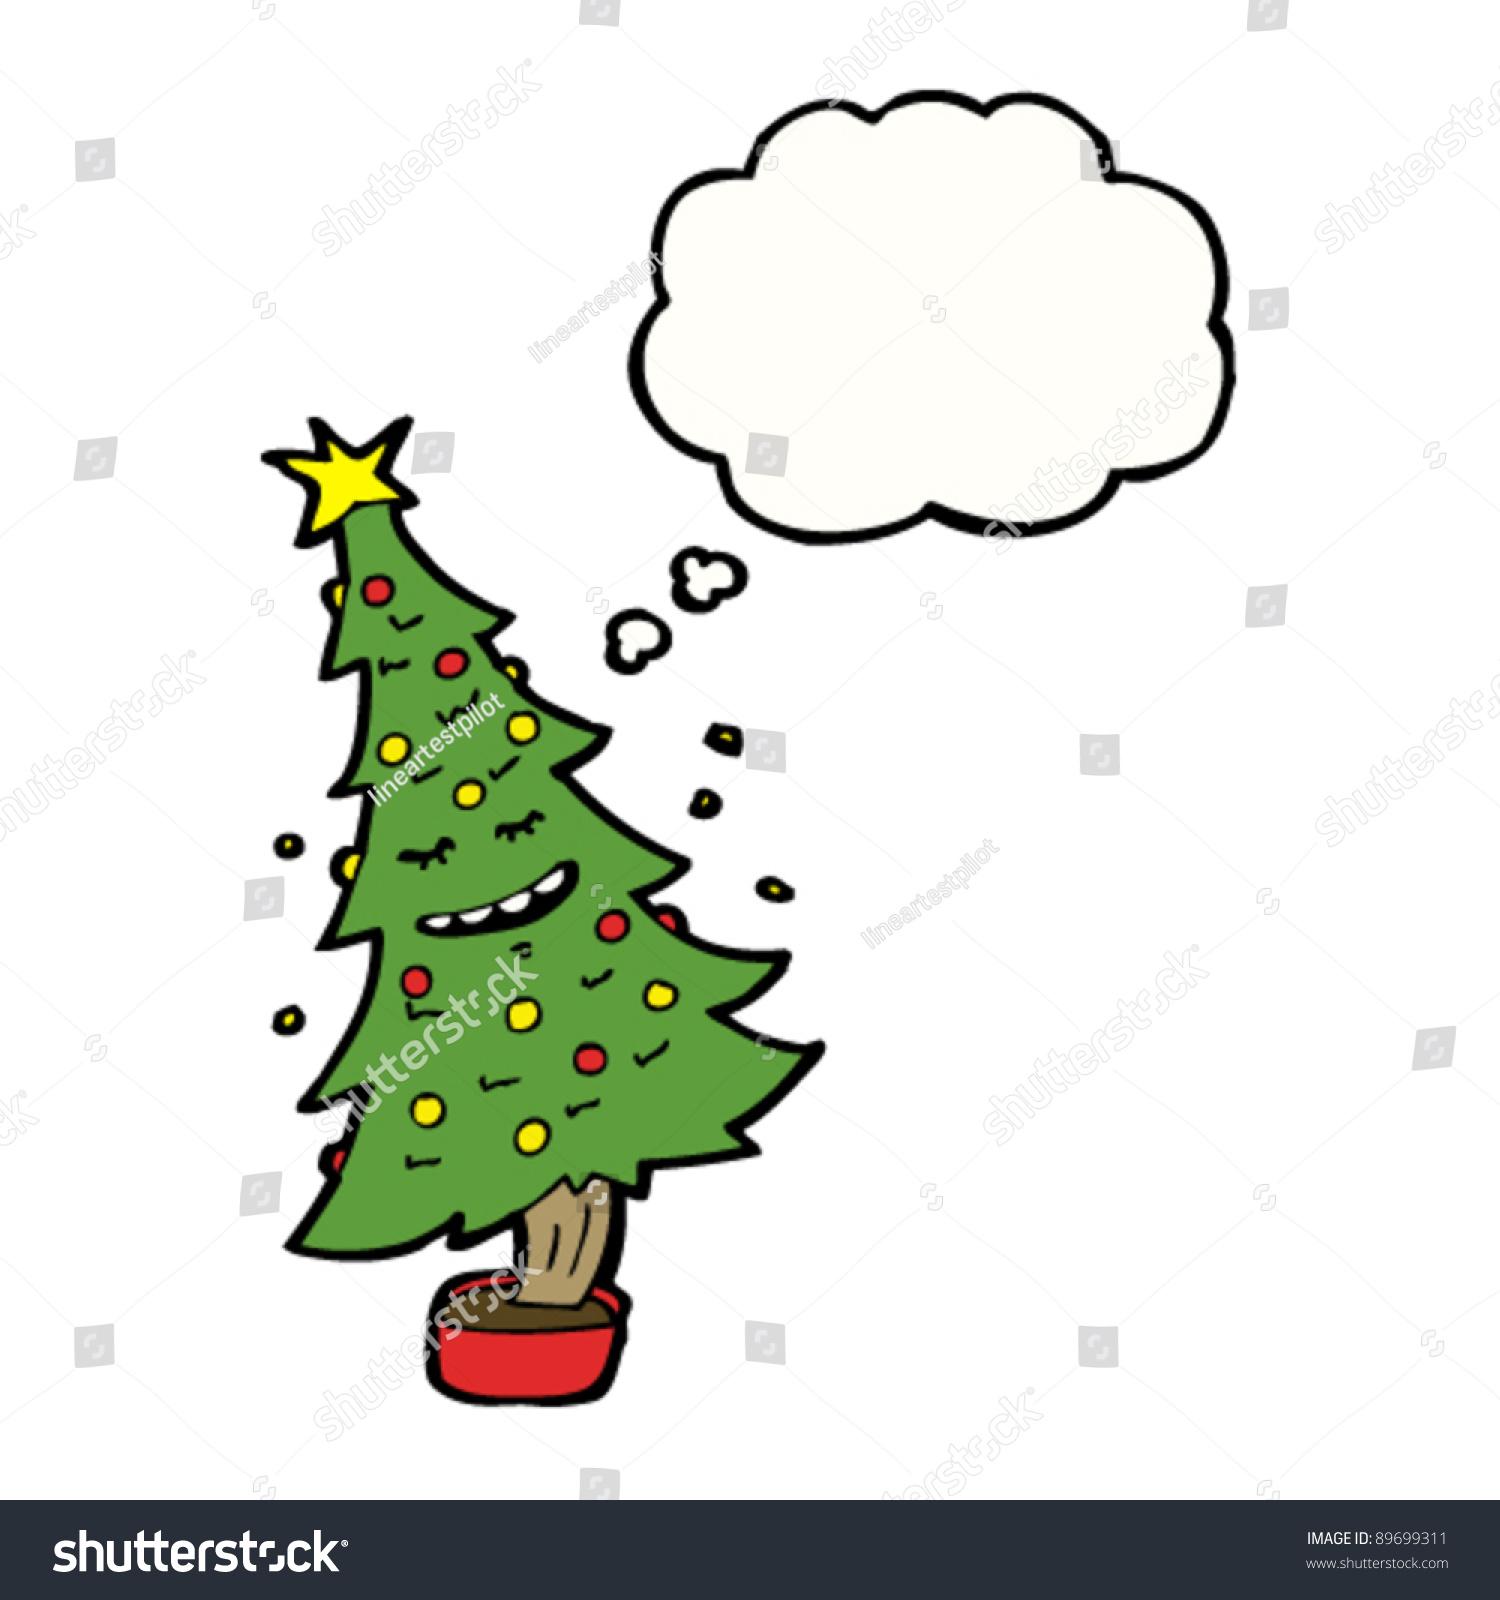 dancing christmas tree cartoon character stock vector 89699311